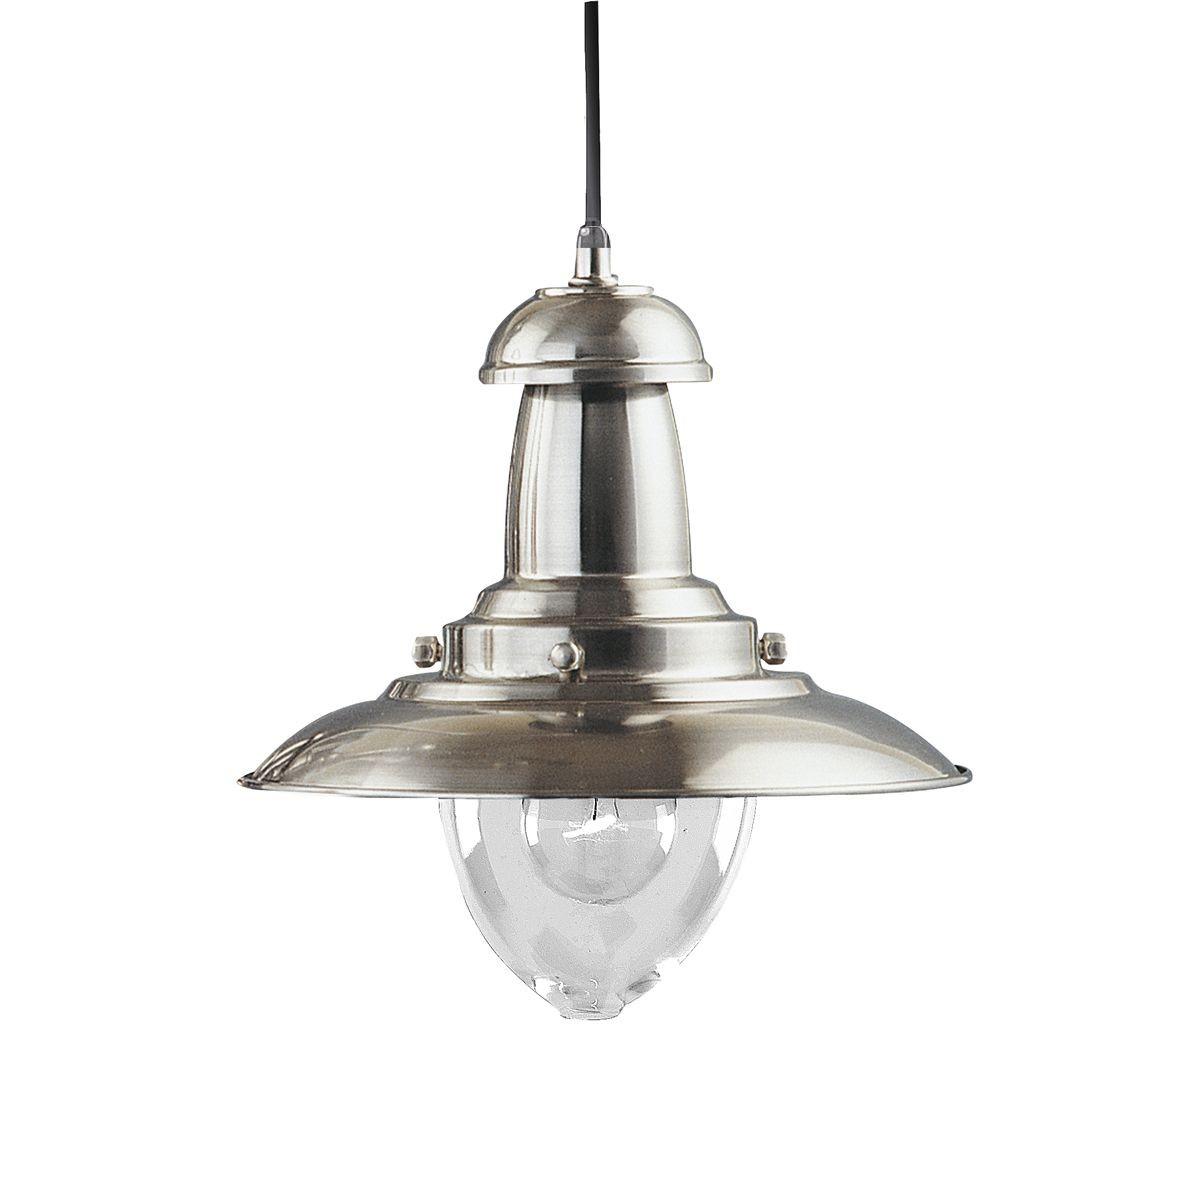 Fisherman Lantern Ceiling Light Satin Silver